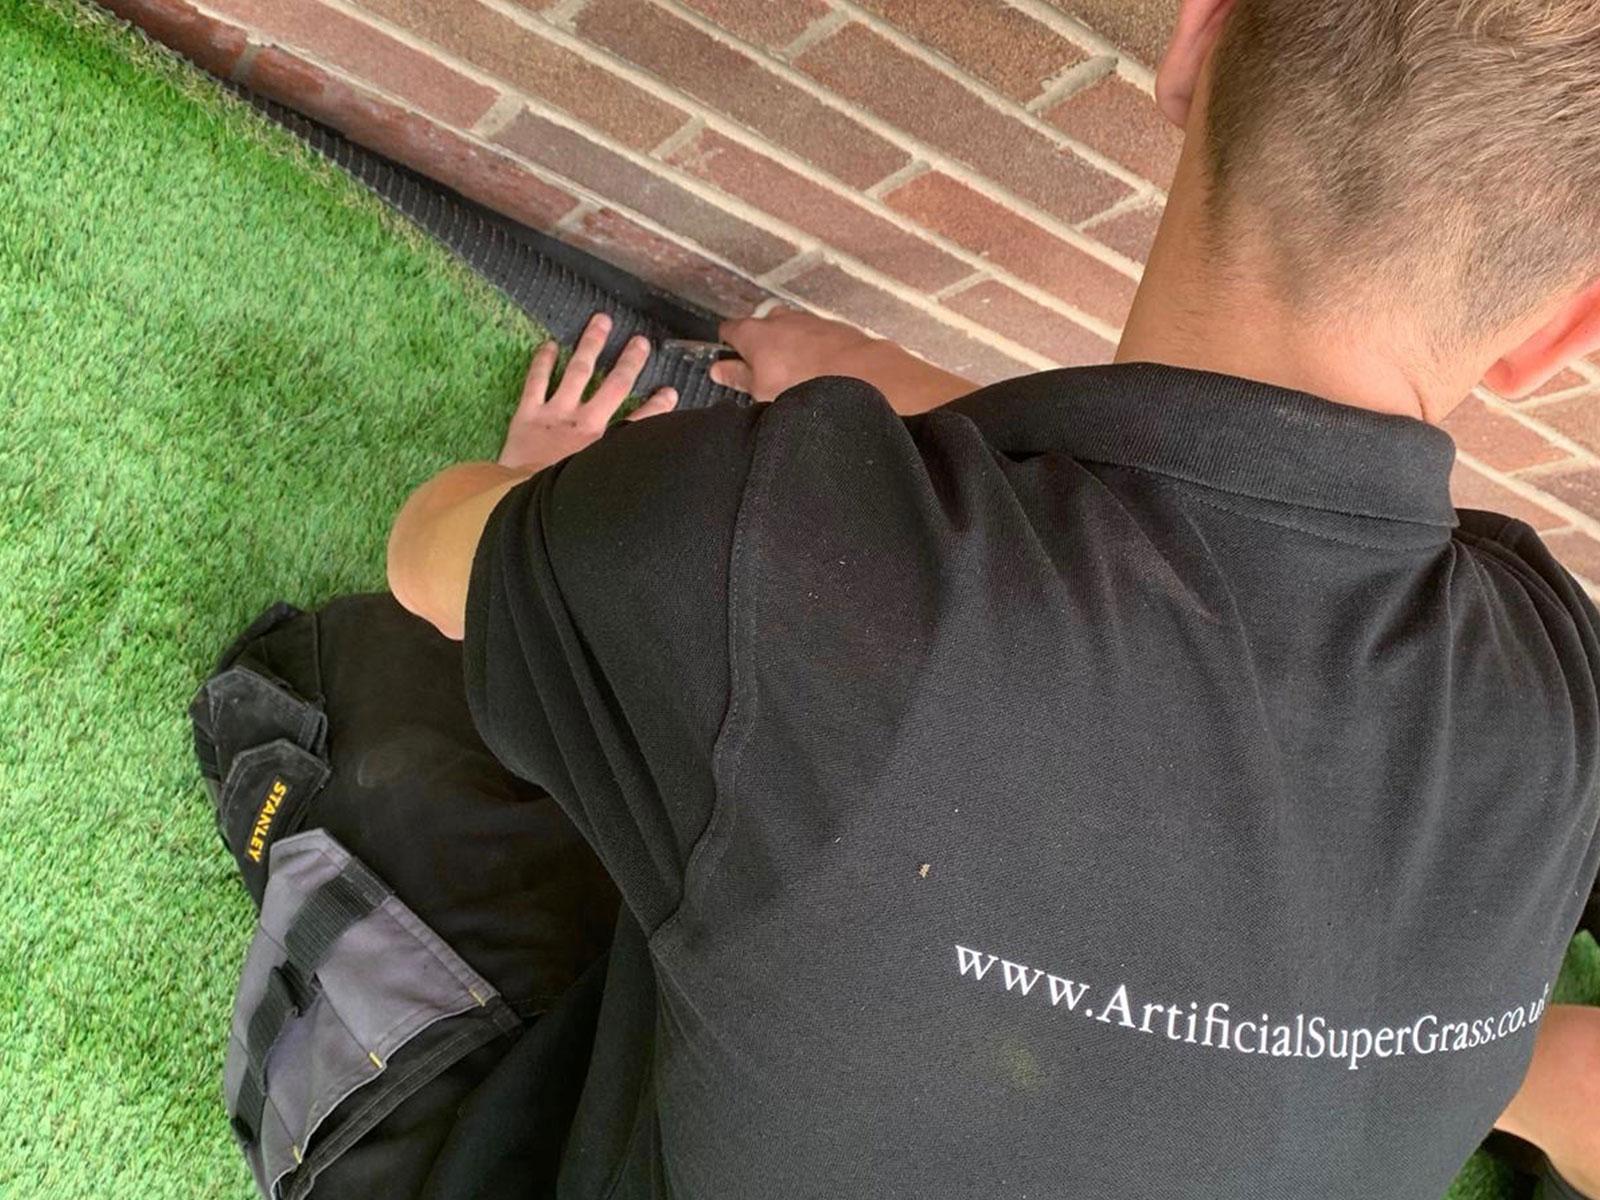 Astro Turf Reading Artificial Super Grass